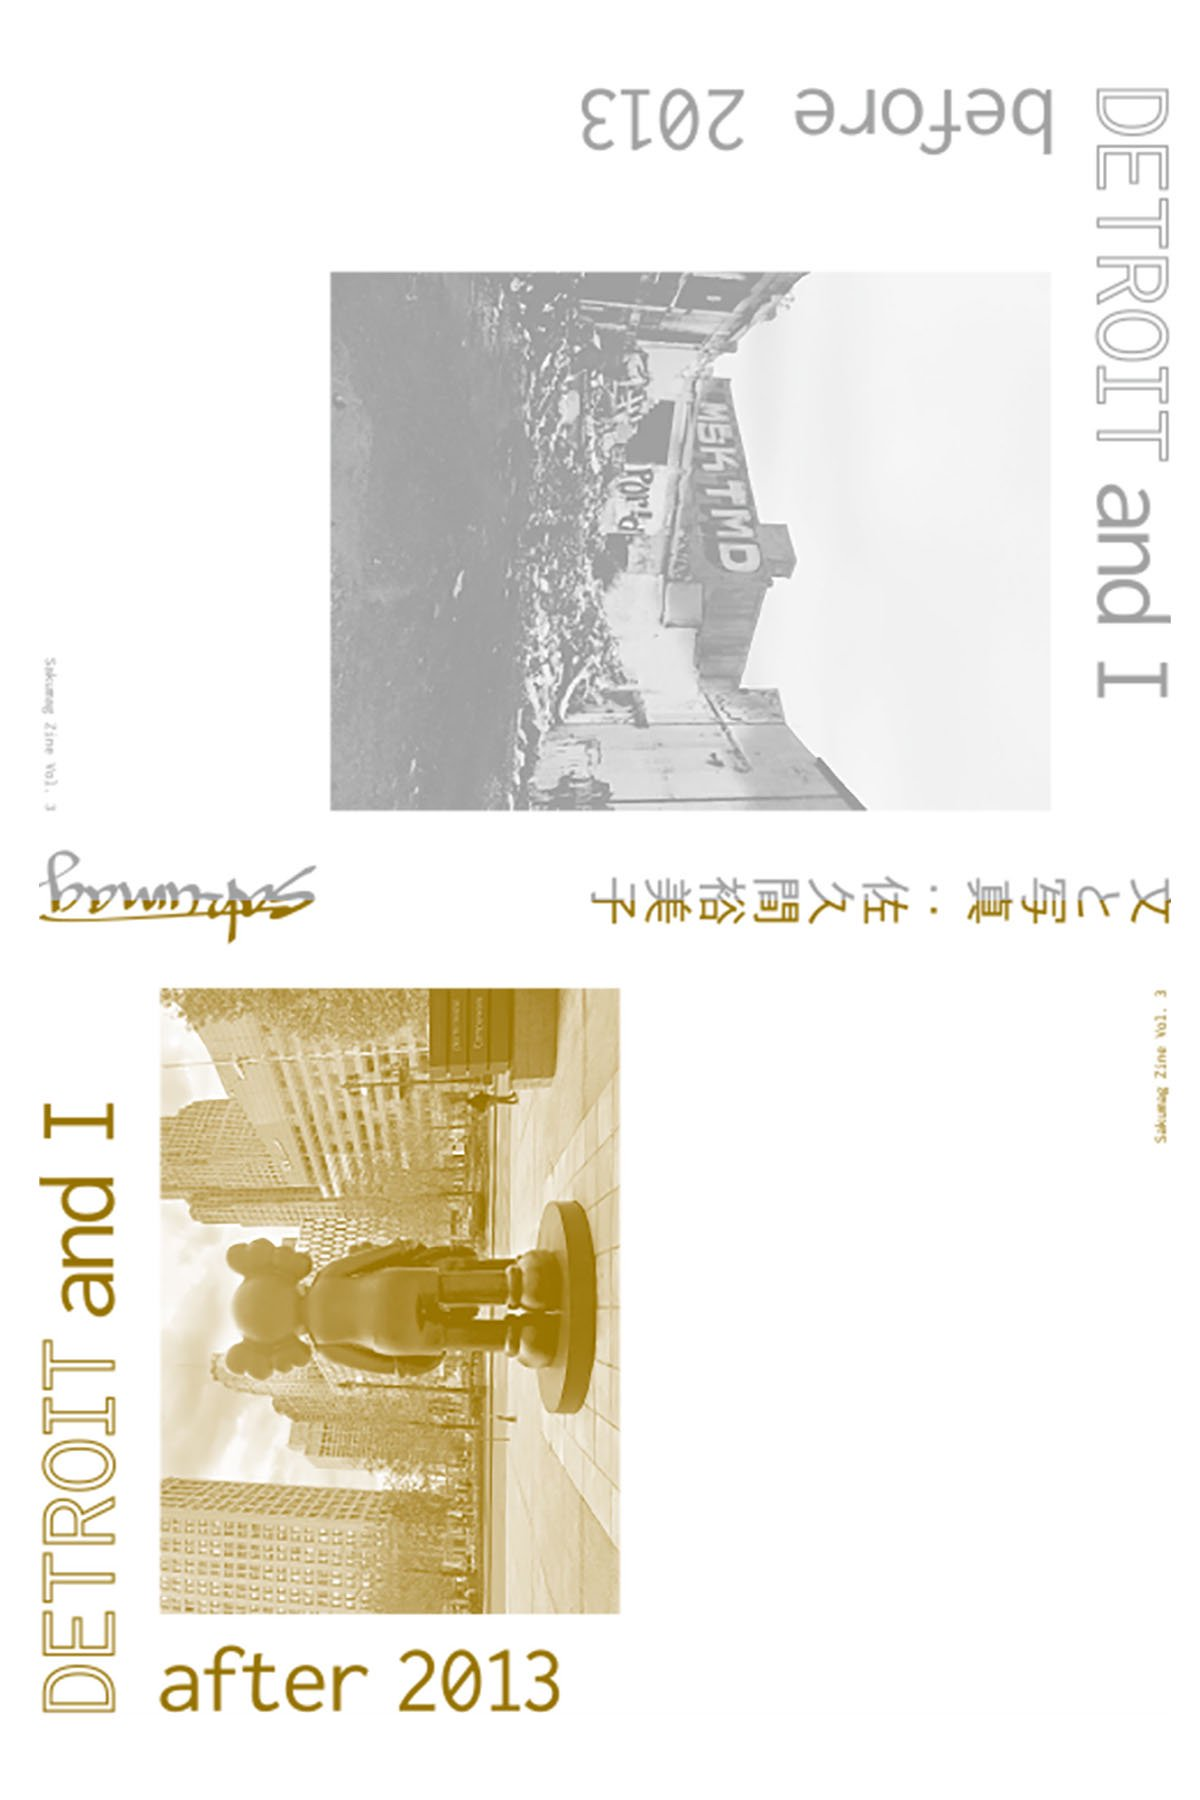 Sakumag Vol.3 DETROIT and I - before 2013 / after 2013